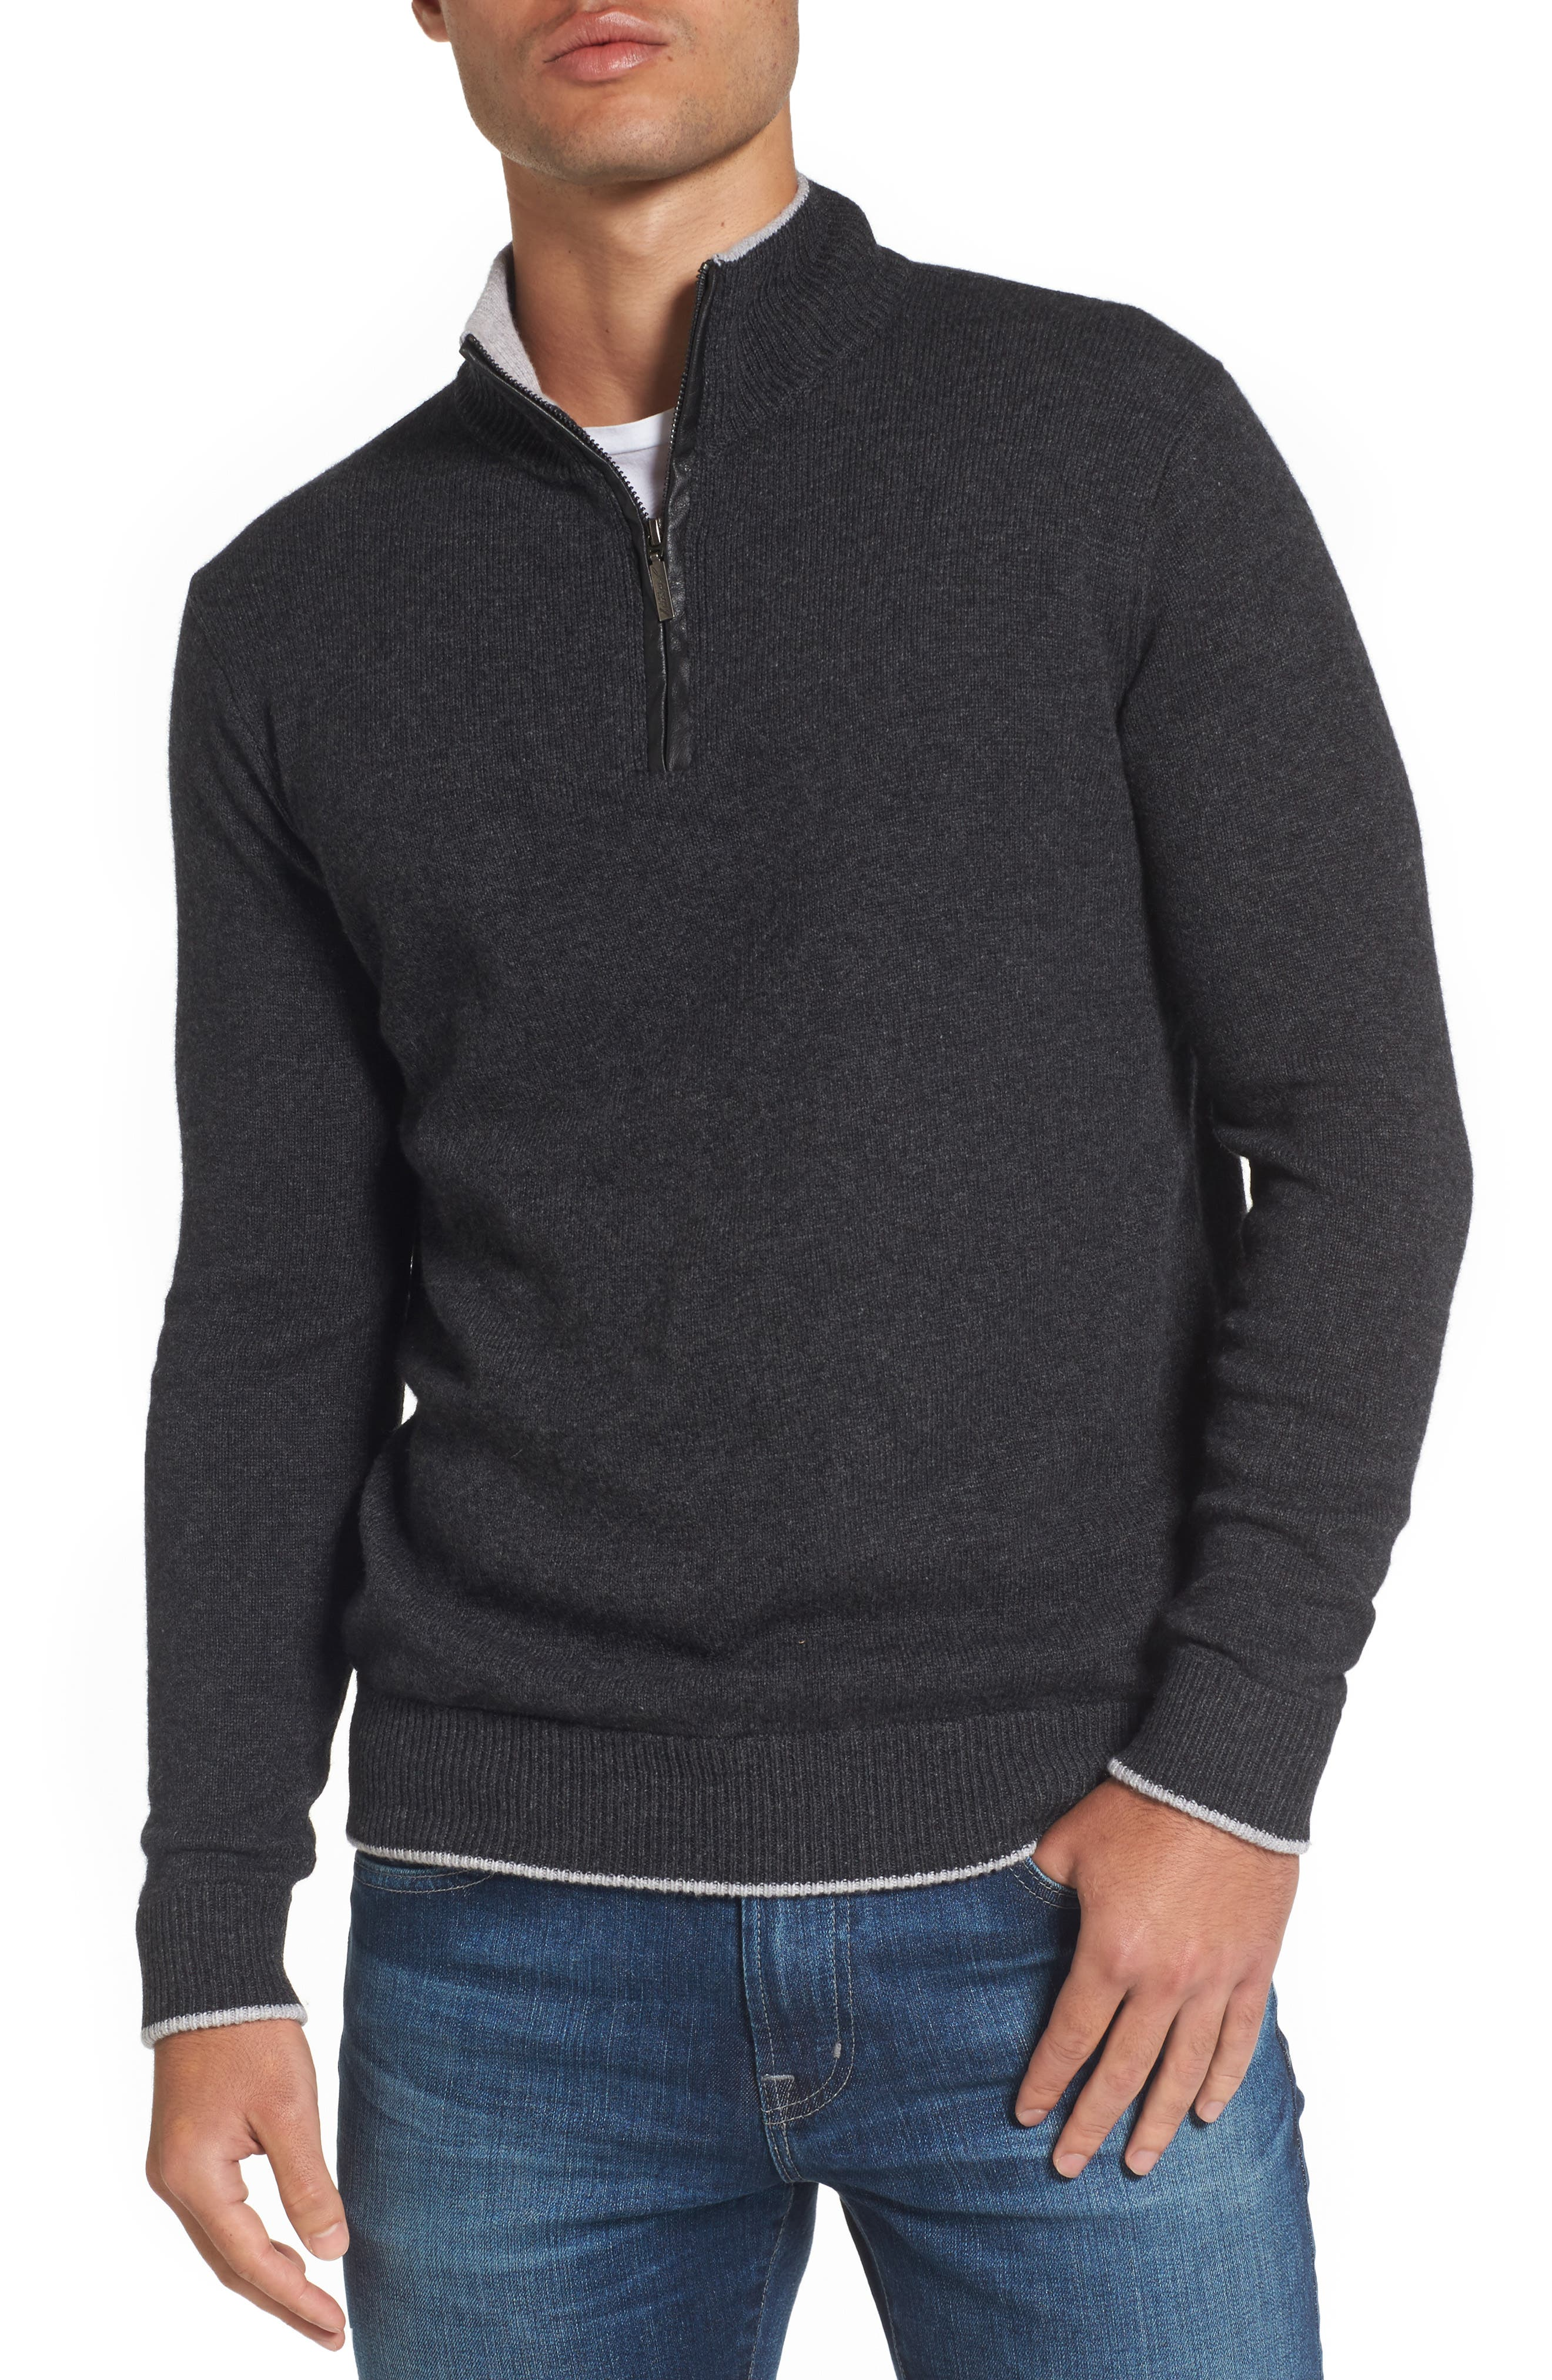 Wool Blend Quarter Zip Sweater,                         Main,                         color, Dark Grey